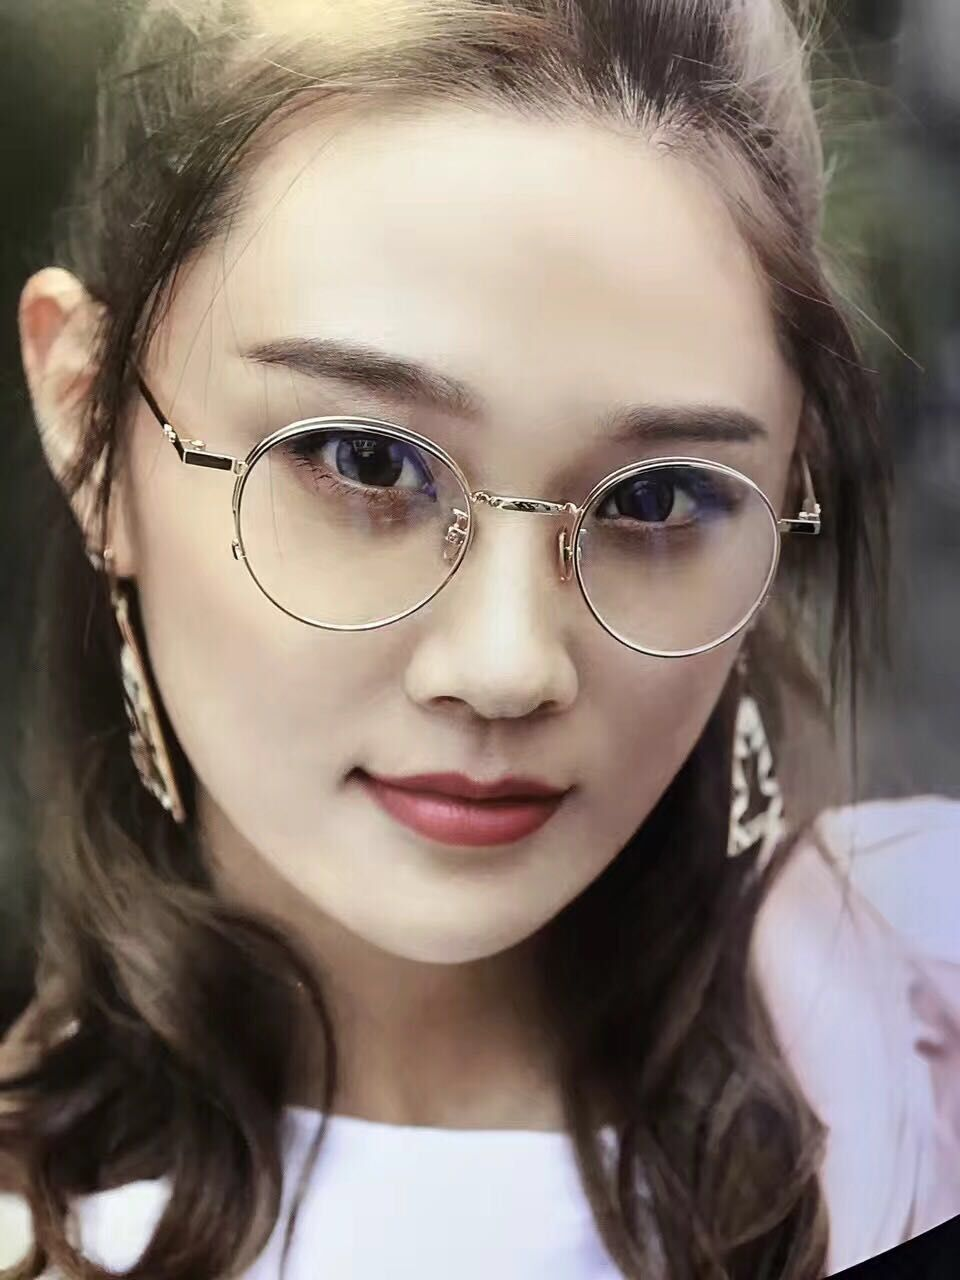 5a2be703db3c53 2018年トレンド眼鏡メガネレトロおしゃれ人気メガネトレンド女性通販メガネ近視度入りフレーム ブランド風伊達めがねフレーム 金属メタル度なし男向け小さい顔超軽量